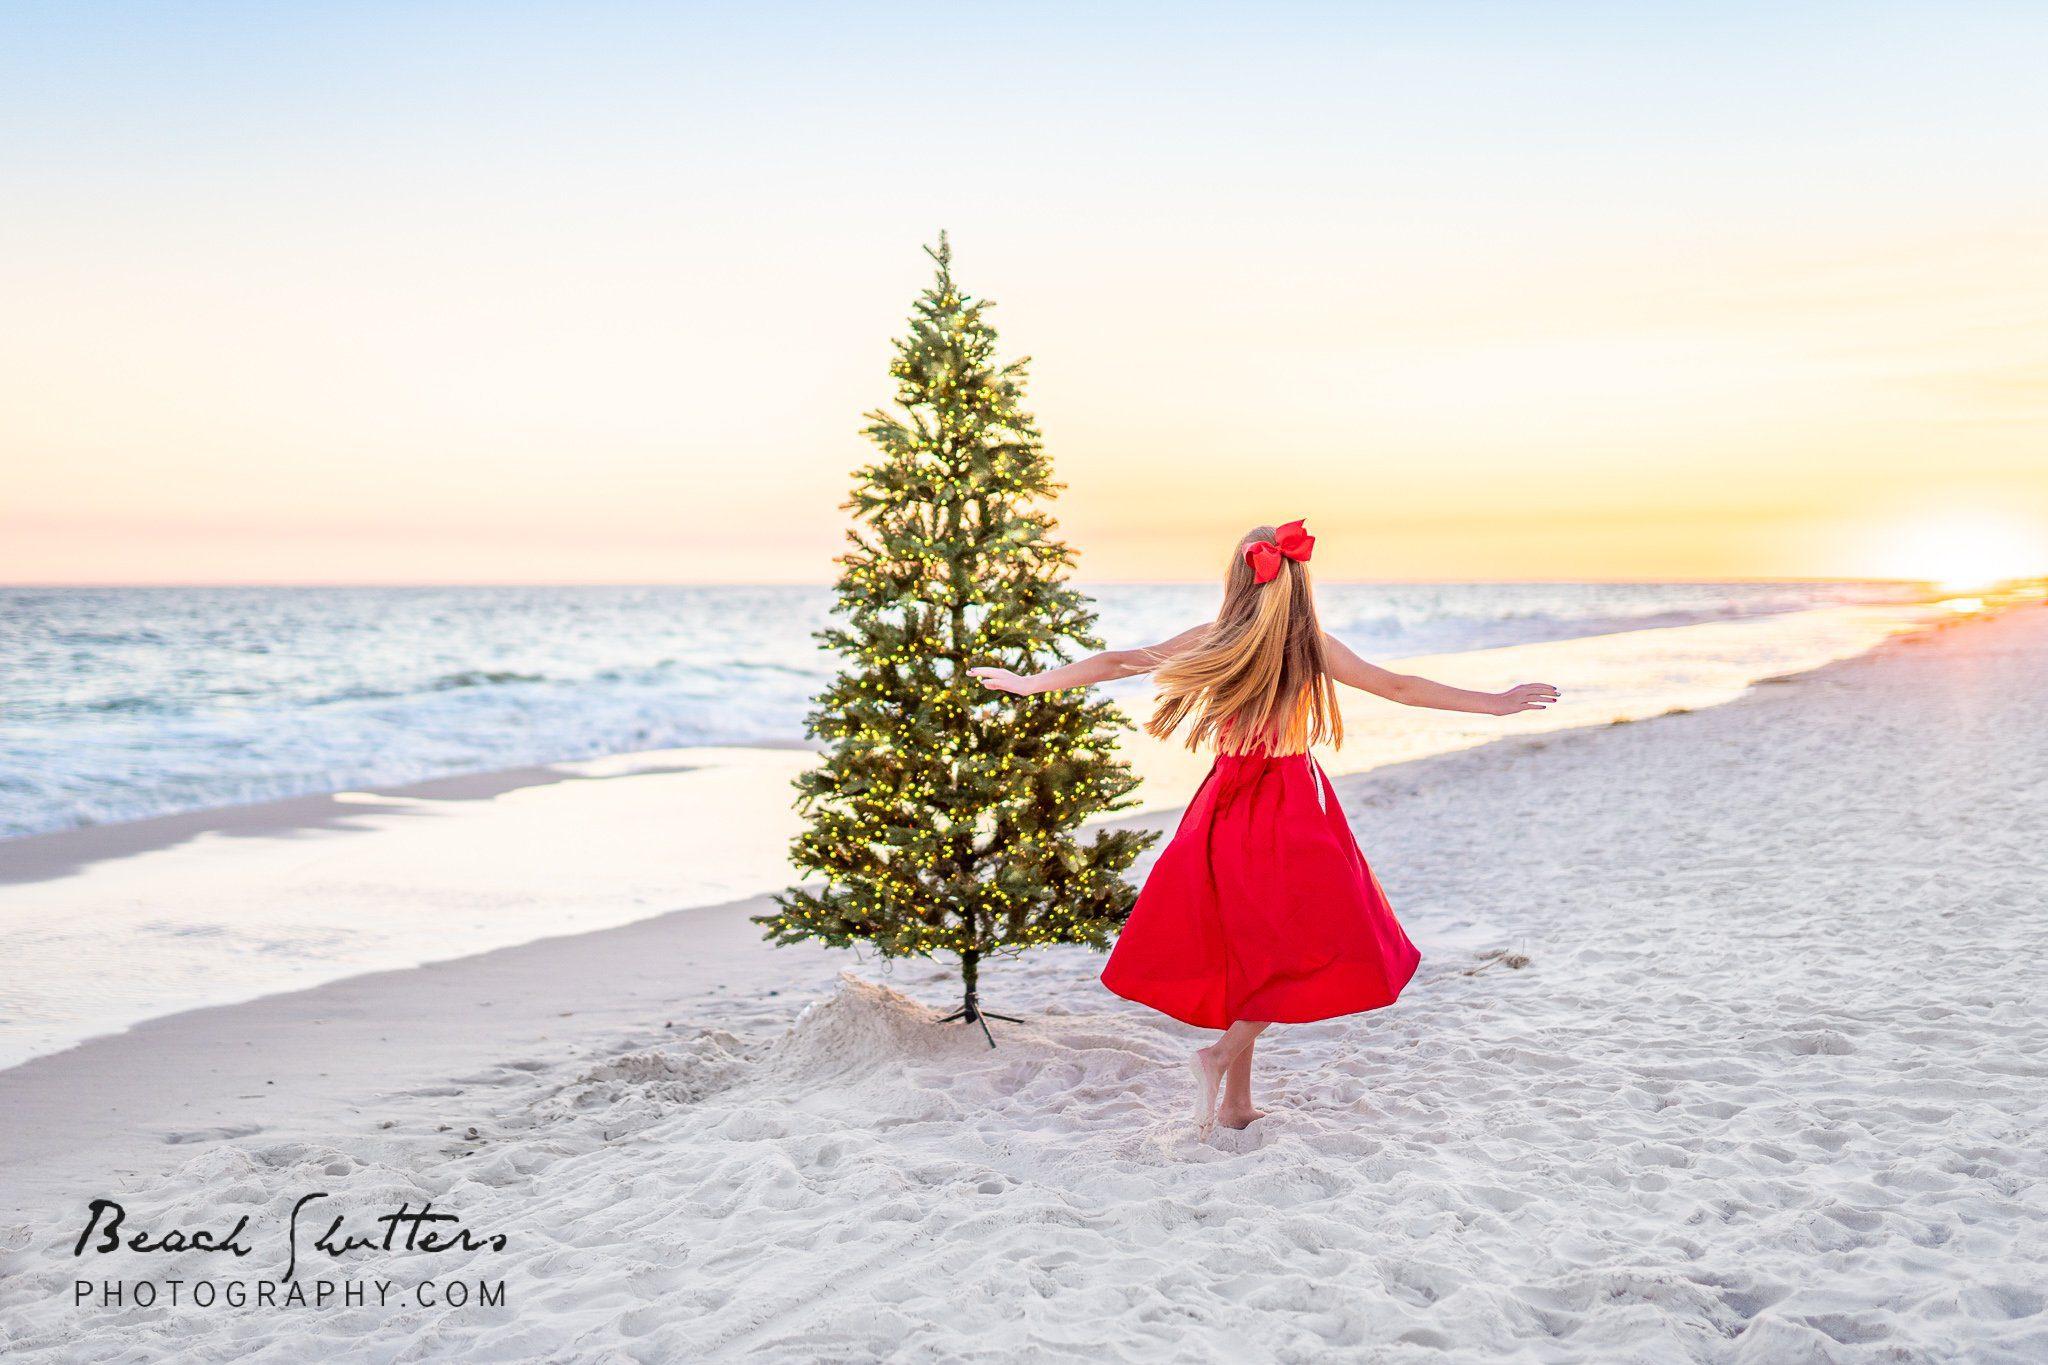 Tree at the beach.